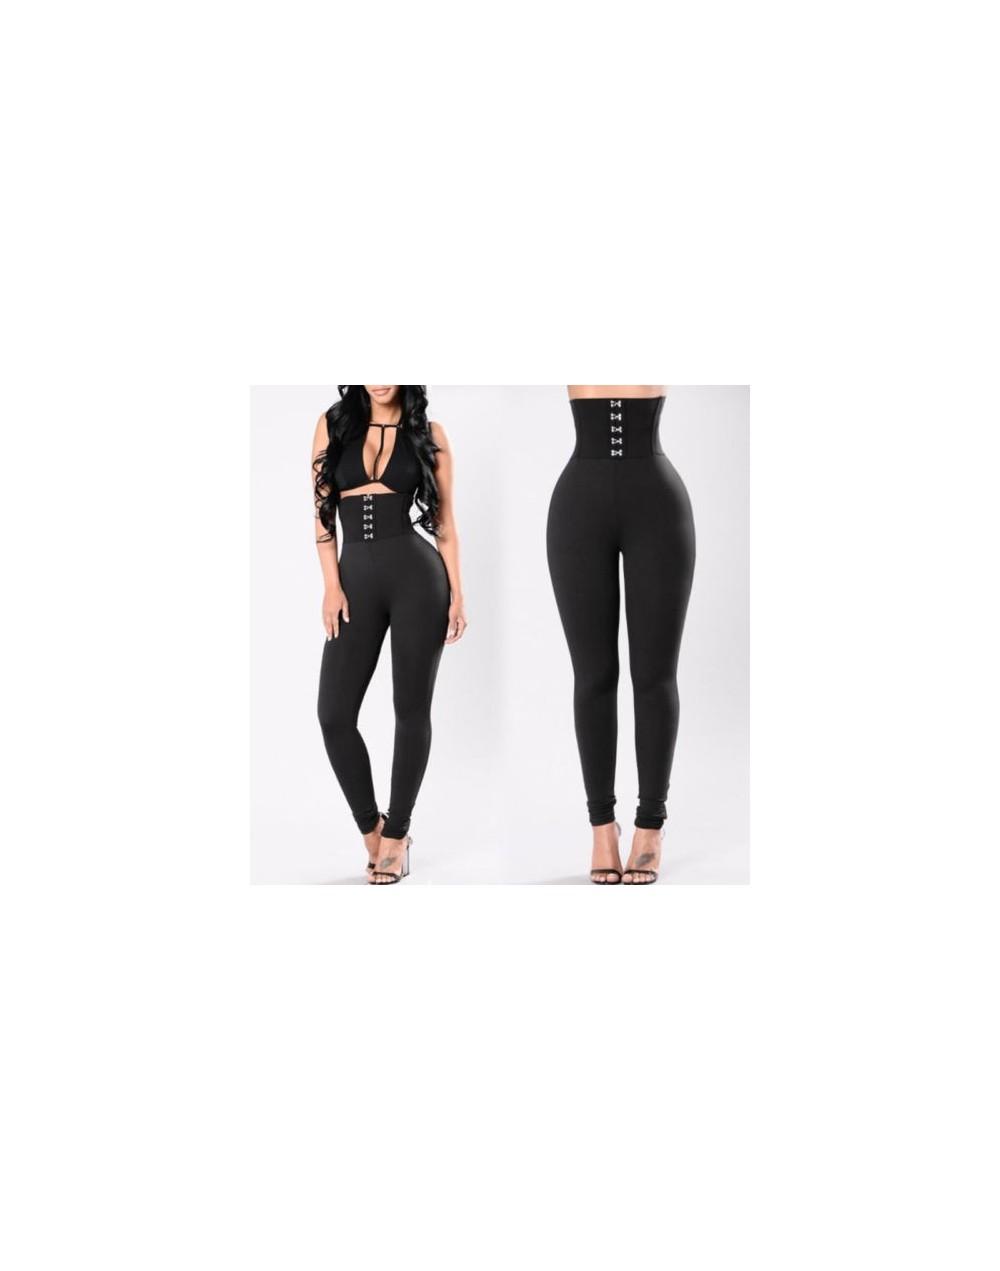 Women Suitable Fitness Leggings Stretch Slim High Waist Pants Trousers - 443062854236